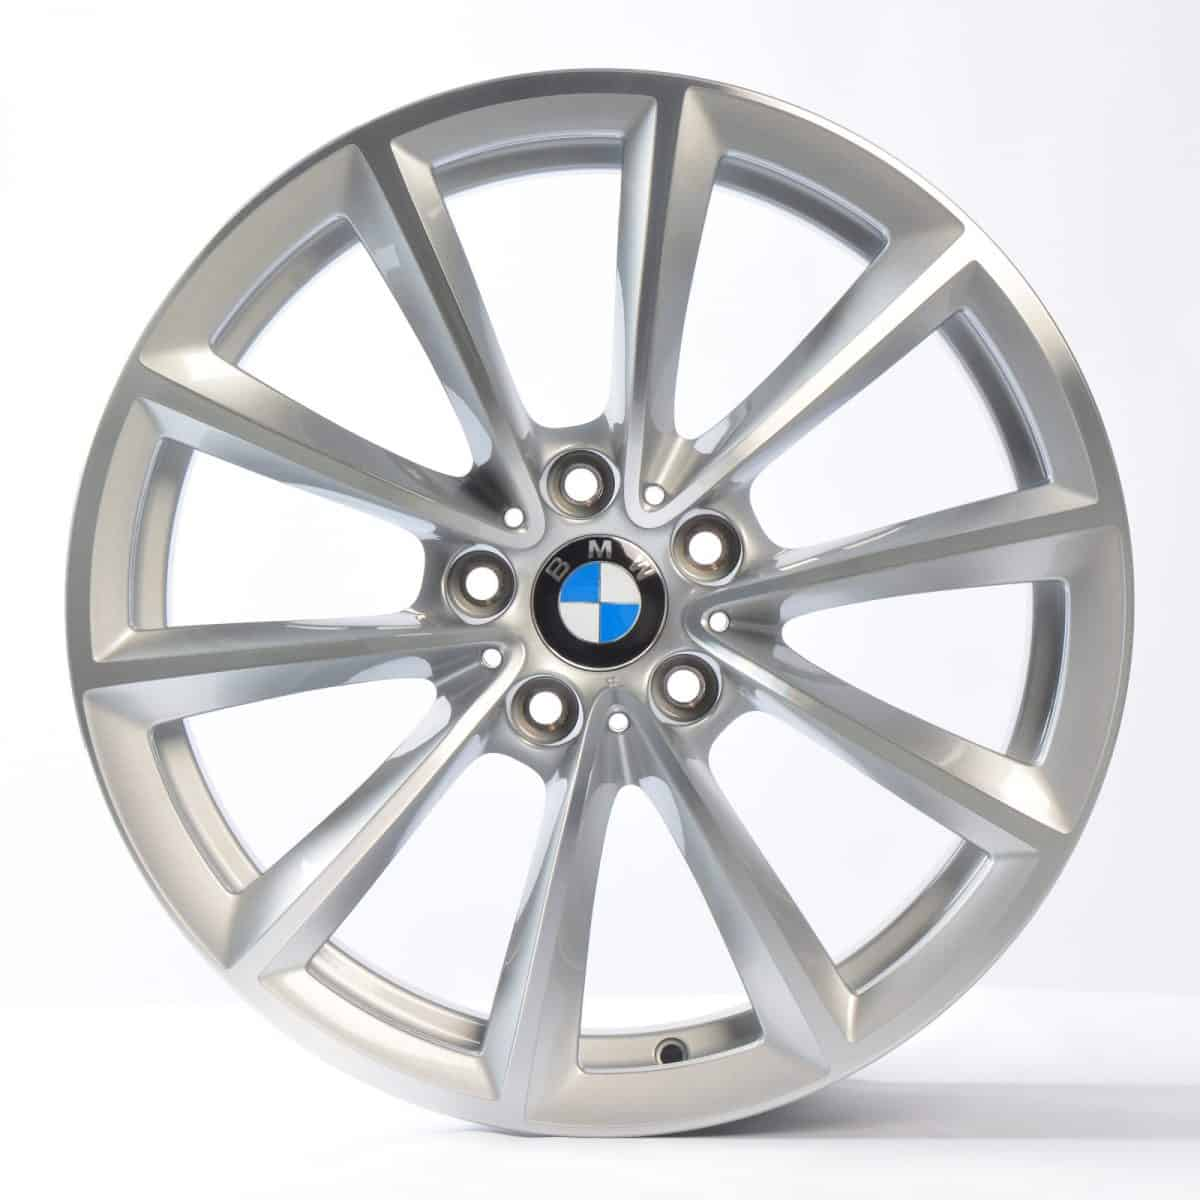 "Genuine BMW Z4 E85 E86 E89 Style 296 19"" inch Alloy Wheels with Silver & Diamond Turned Finish 36116785256 36116785257"